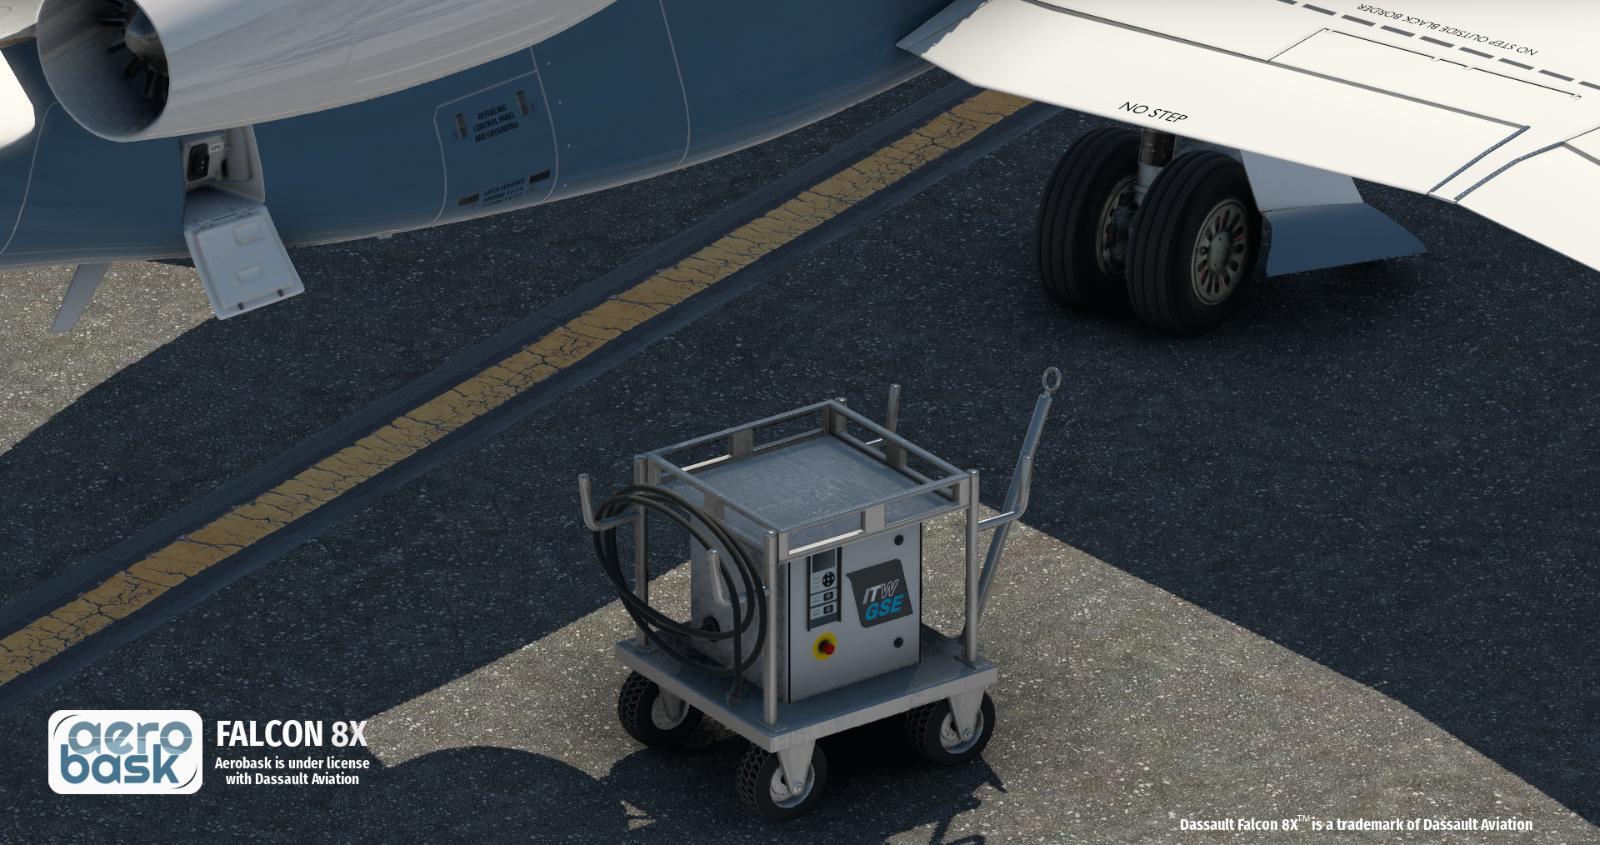 39990247_Aerobask_F8X_9.jpg.3d10ad5ccdf12844933c33947b2cf287